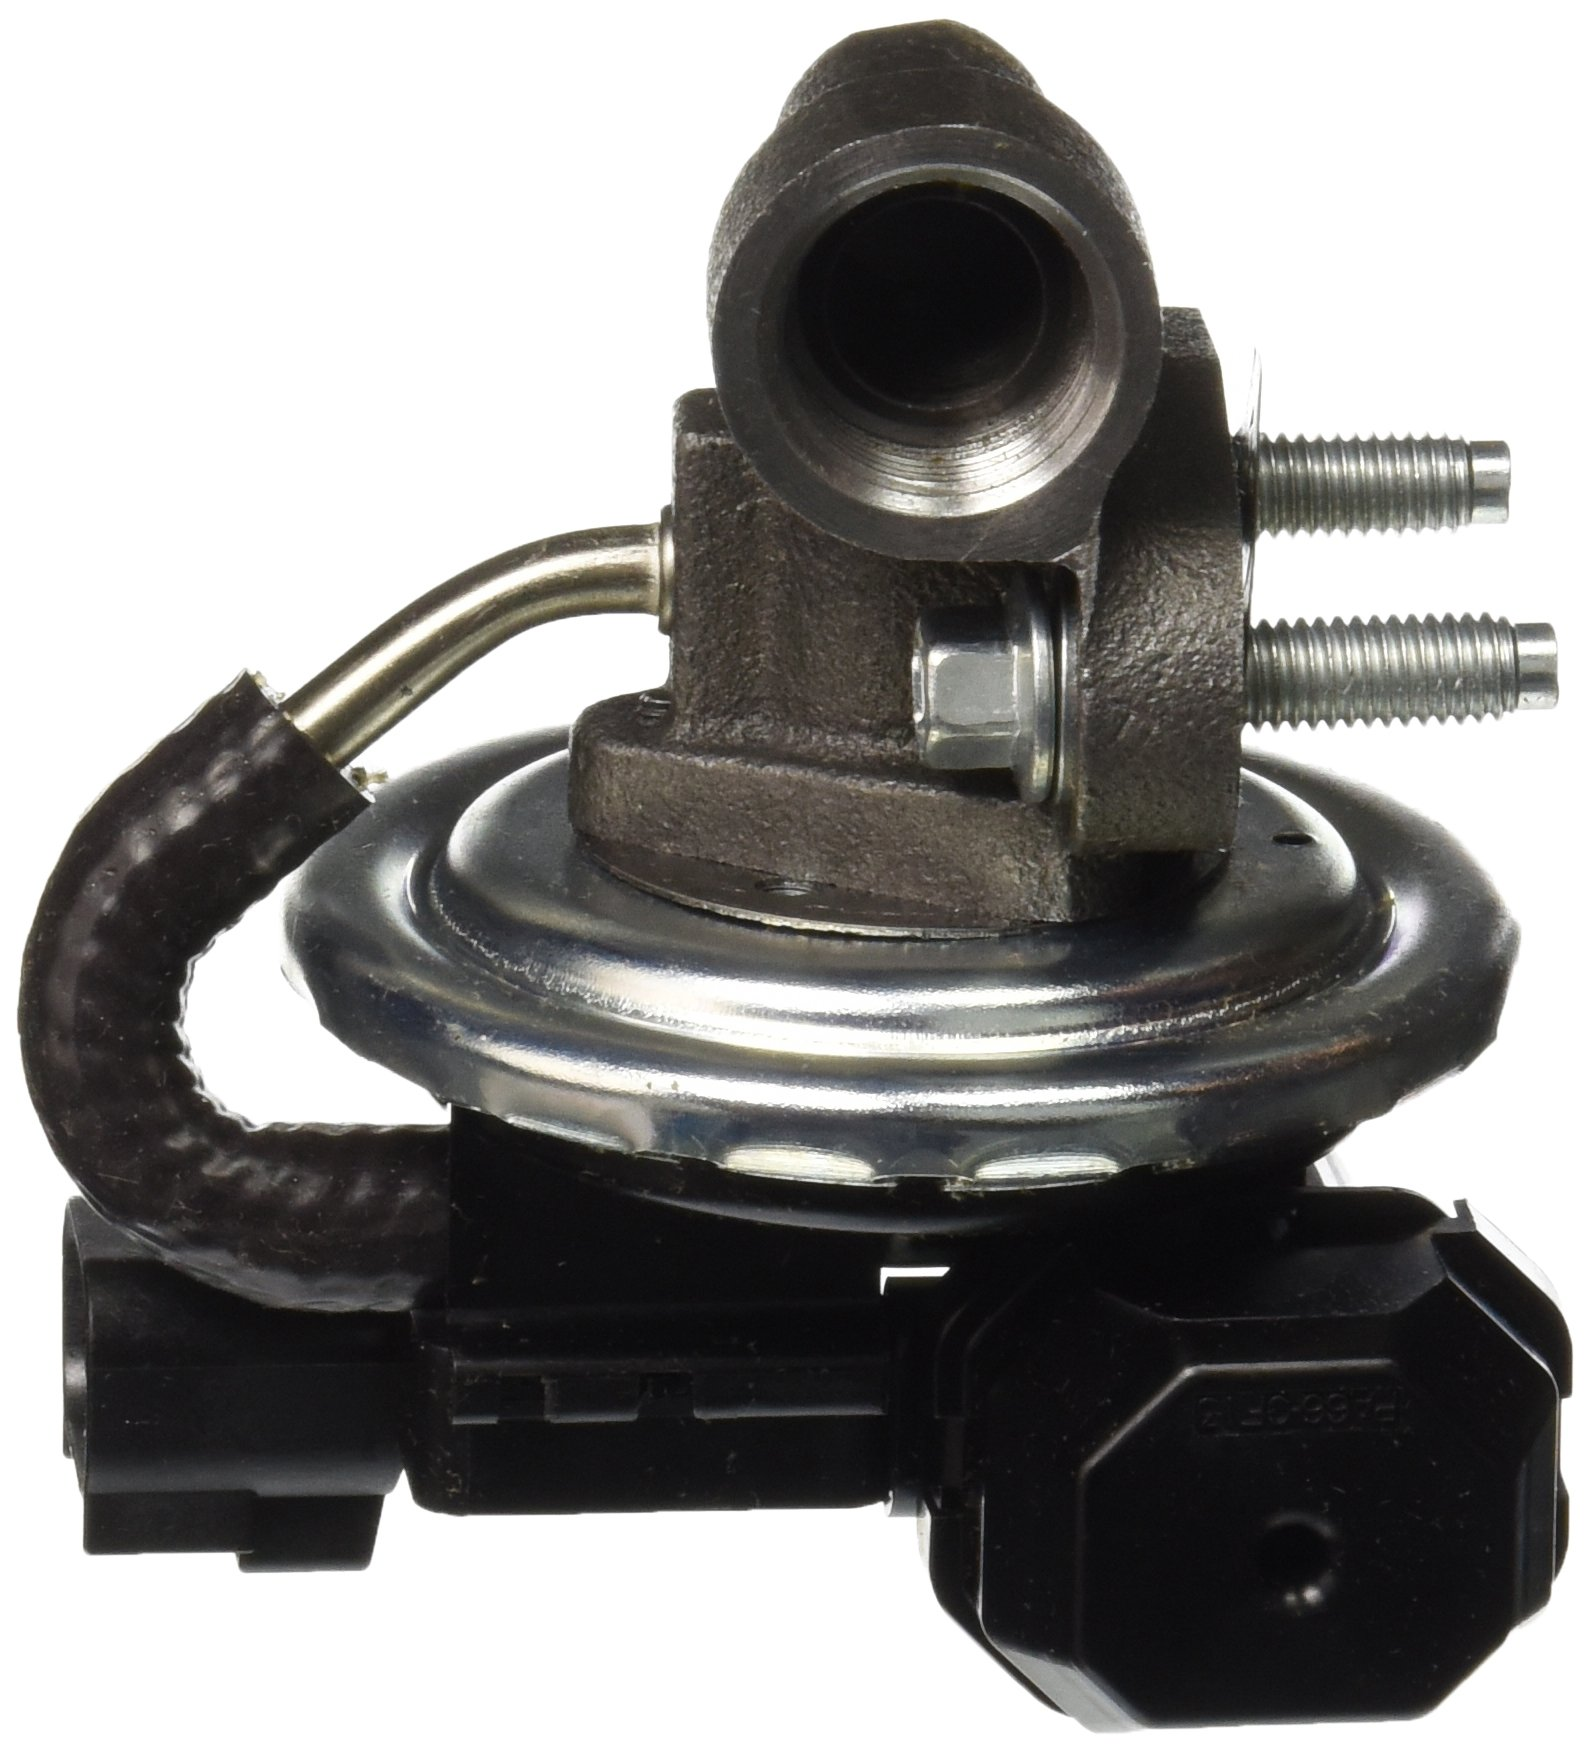 Motorcraft CX2060 Exhaust Gas Recirculation Position Sensor by Motorcraft